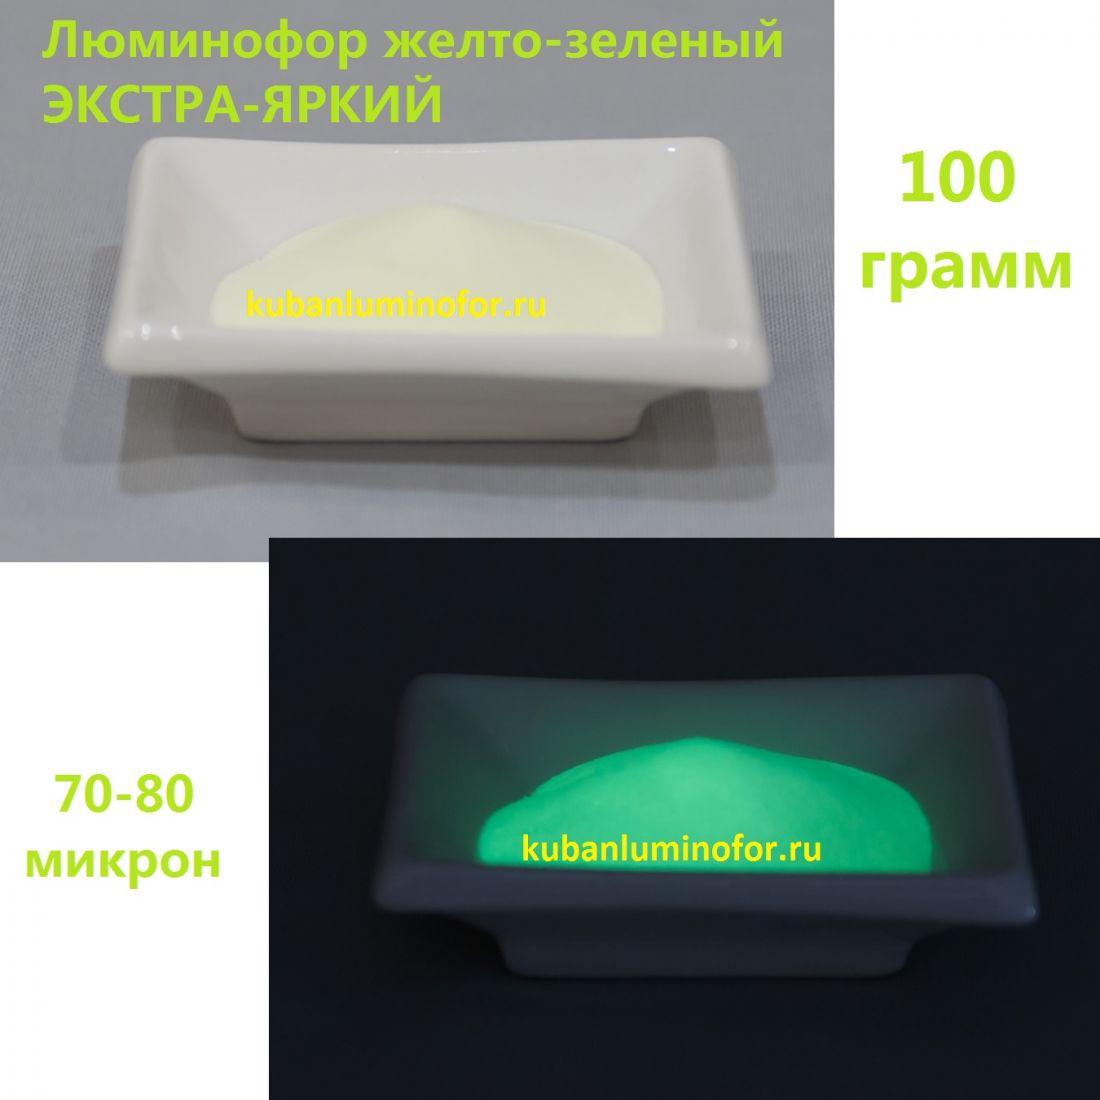 Люминофор желто-зеленый ЭКСТРА-ЯРКИЙ KLZ 100 грамм